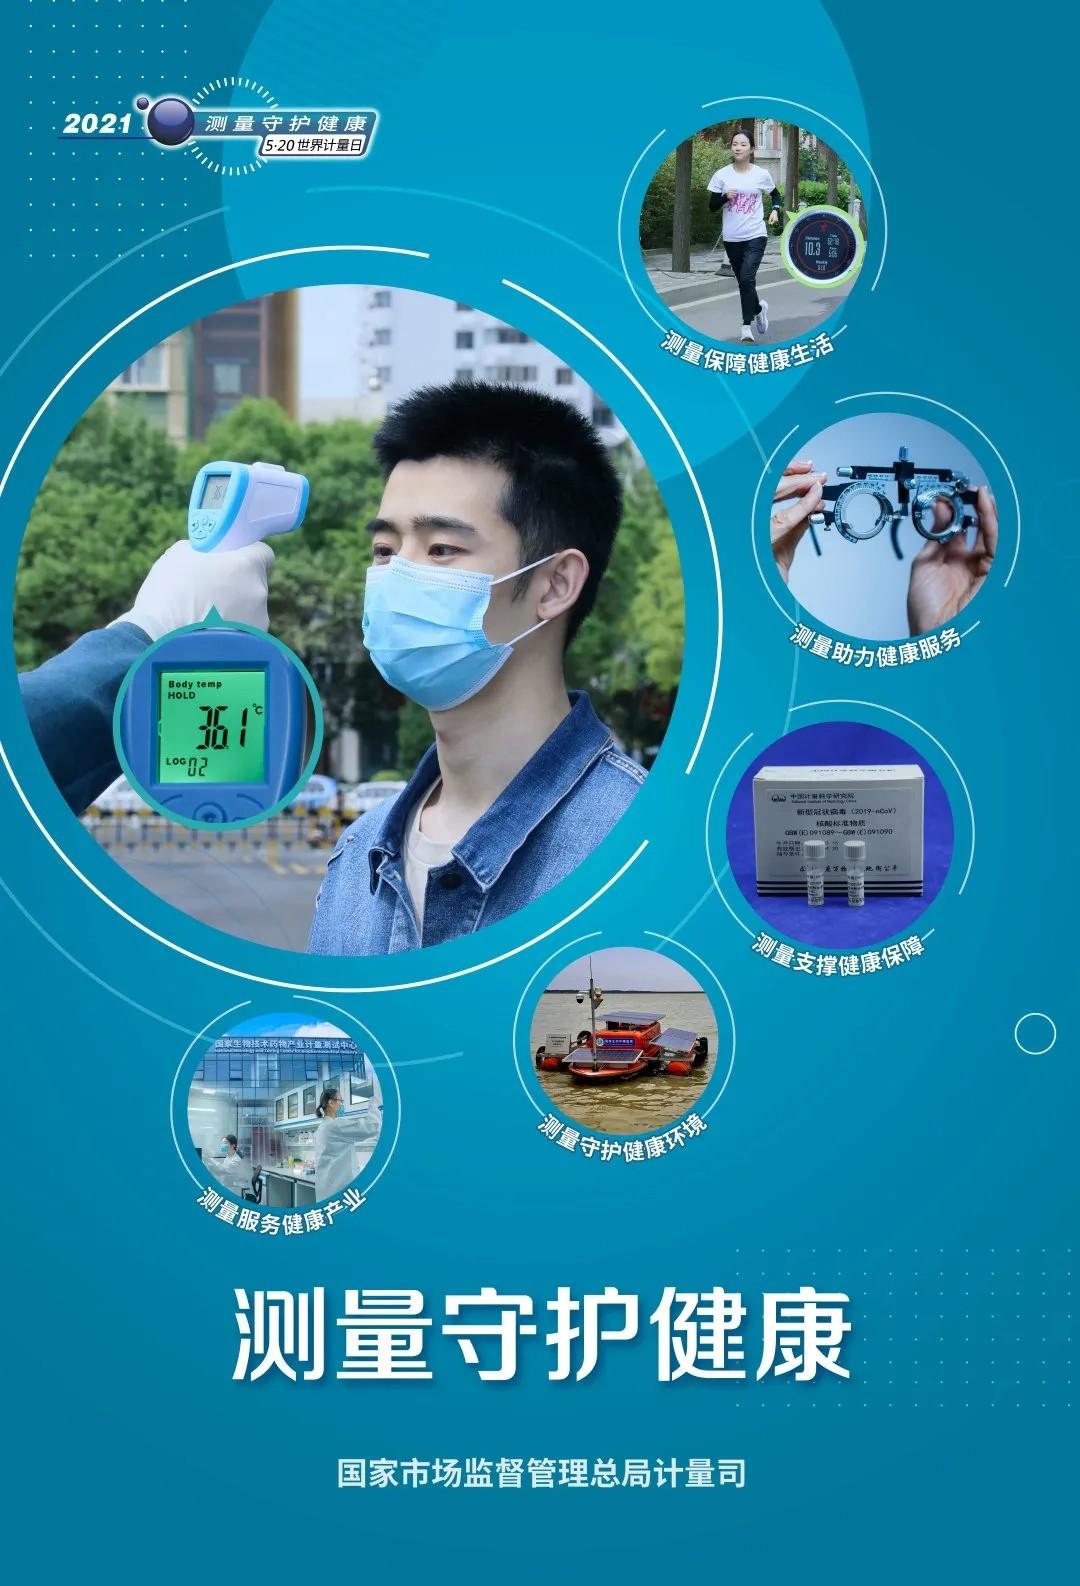 2021nba收米视频直播日 中国版海报.jpg